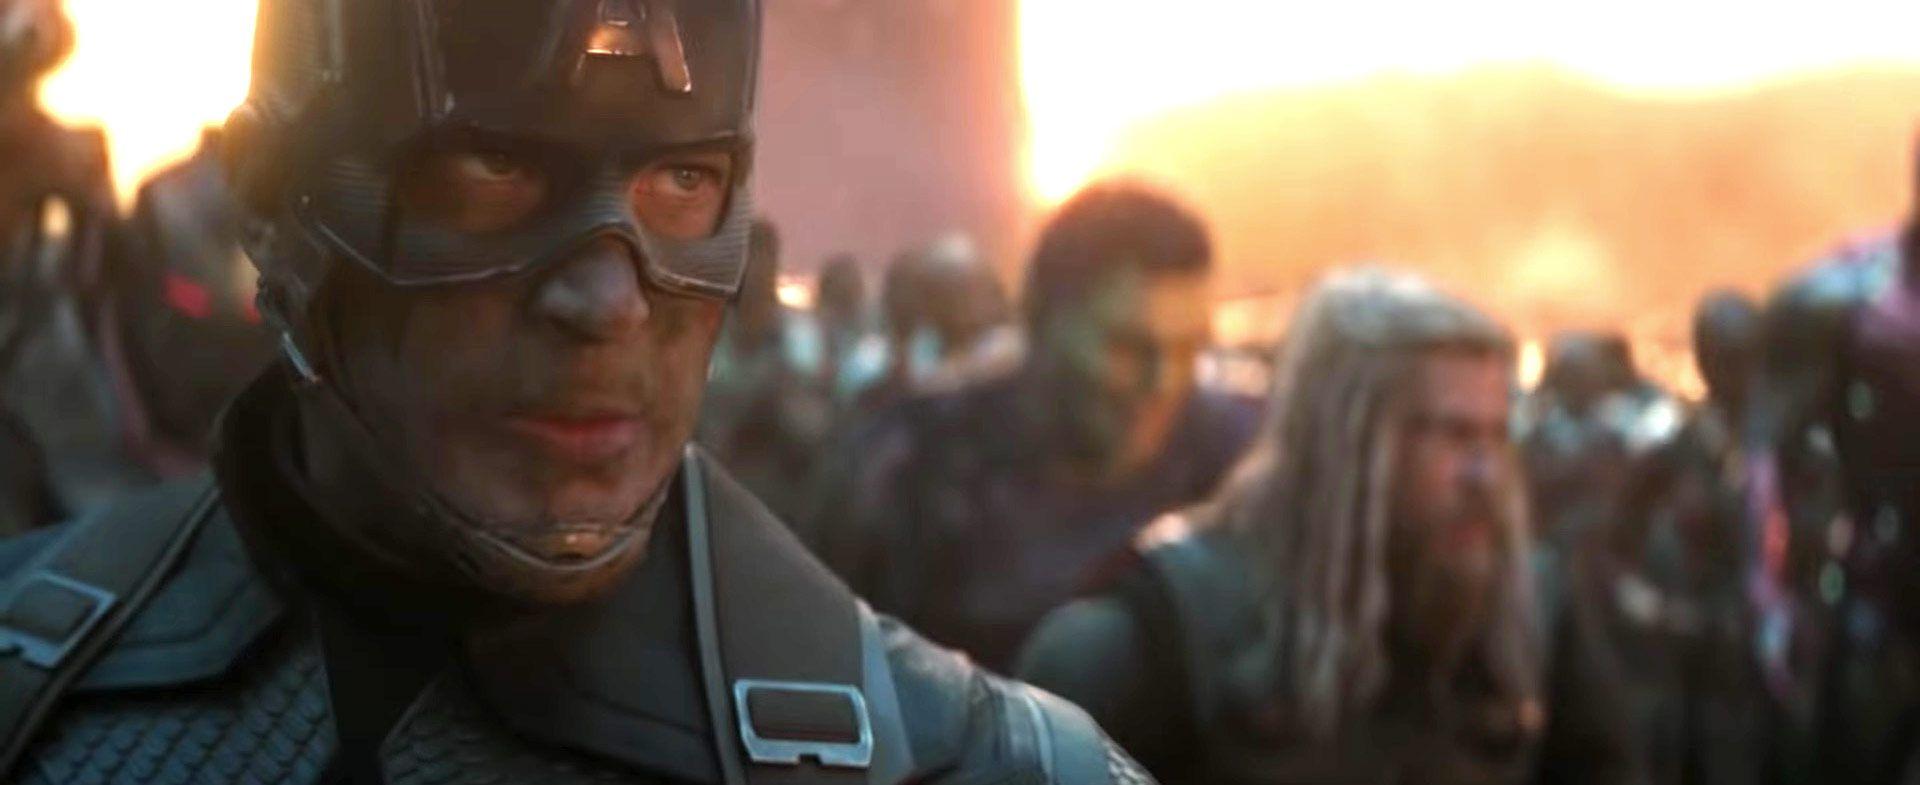 Steve Rogers has one last heroic moment for the MCU fandom.